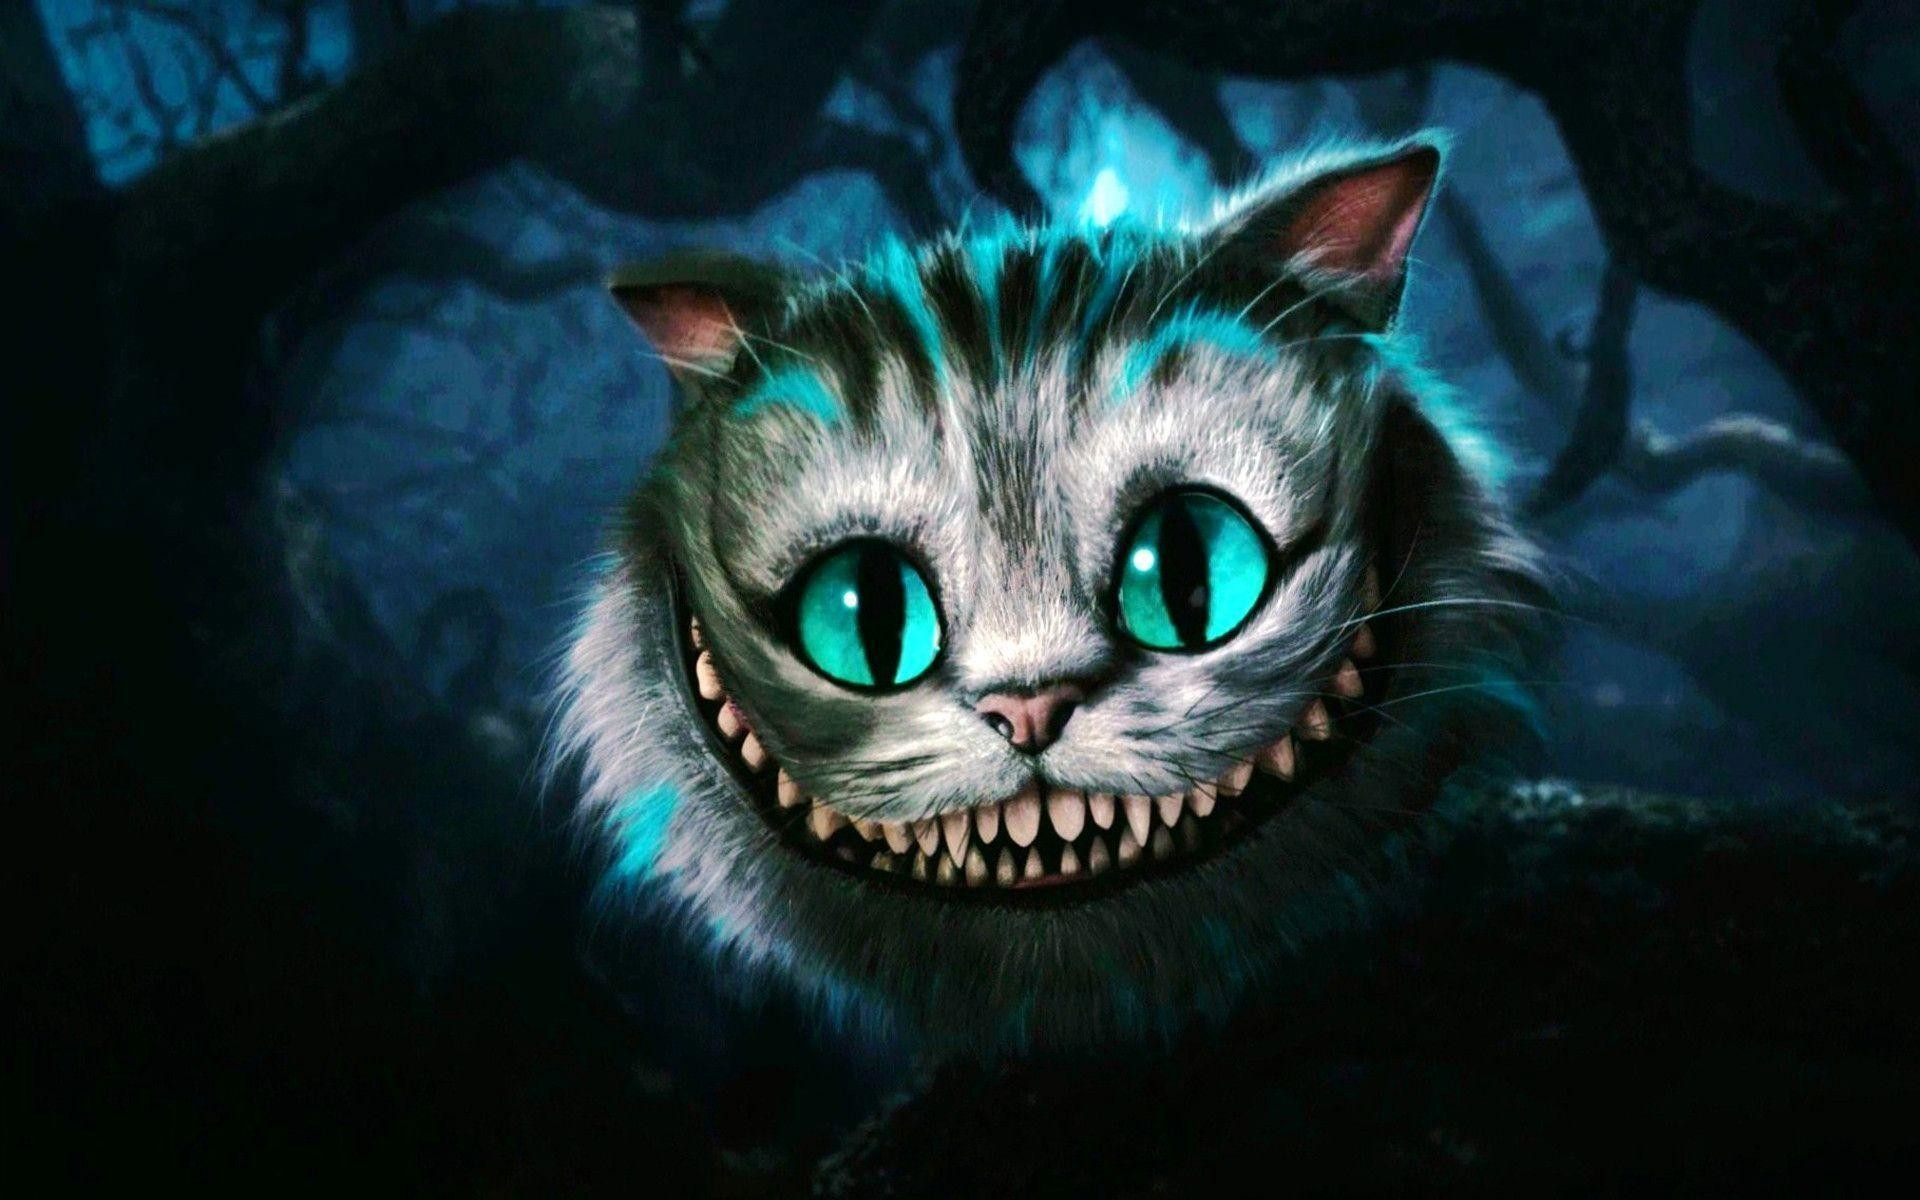 Cool Cheshire Cat Wallpaper 1920x1200PX ~ Cheshire Cat Wallpaper .